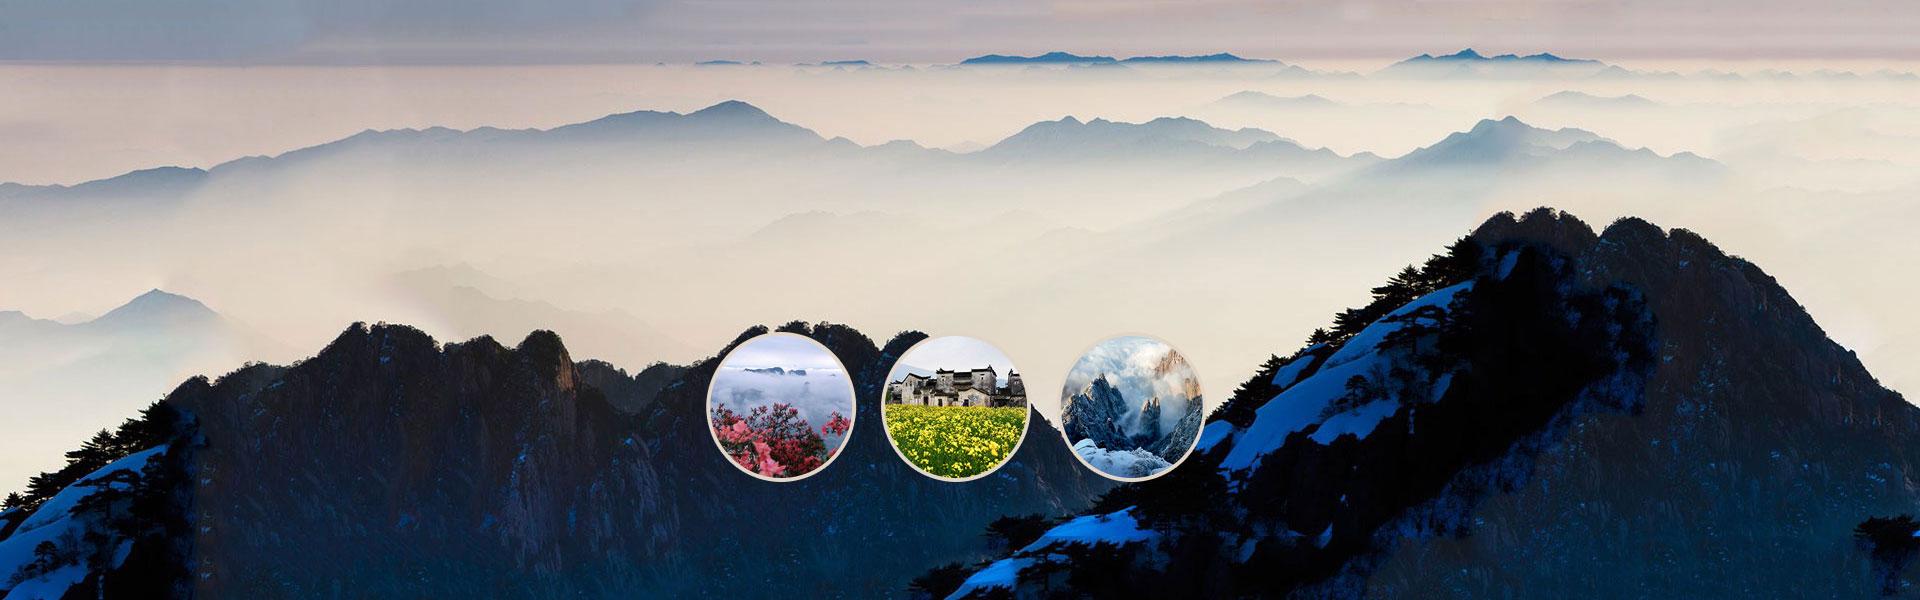 Enjoy the Charming Scenery of Mount Huangshan